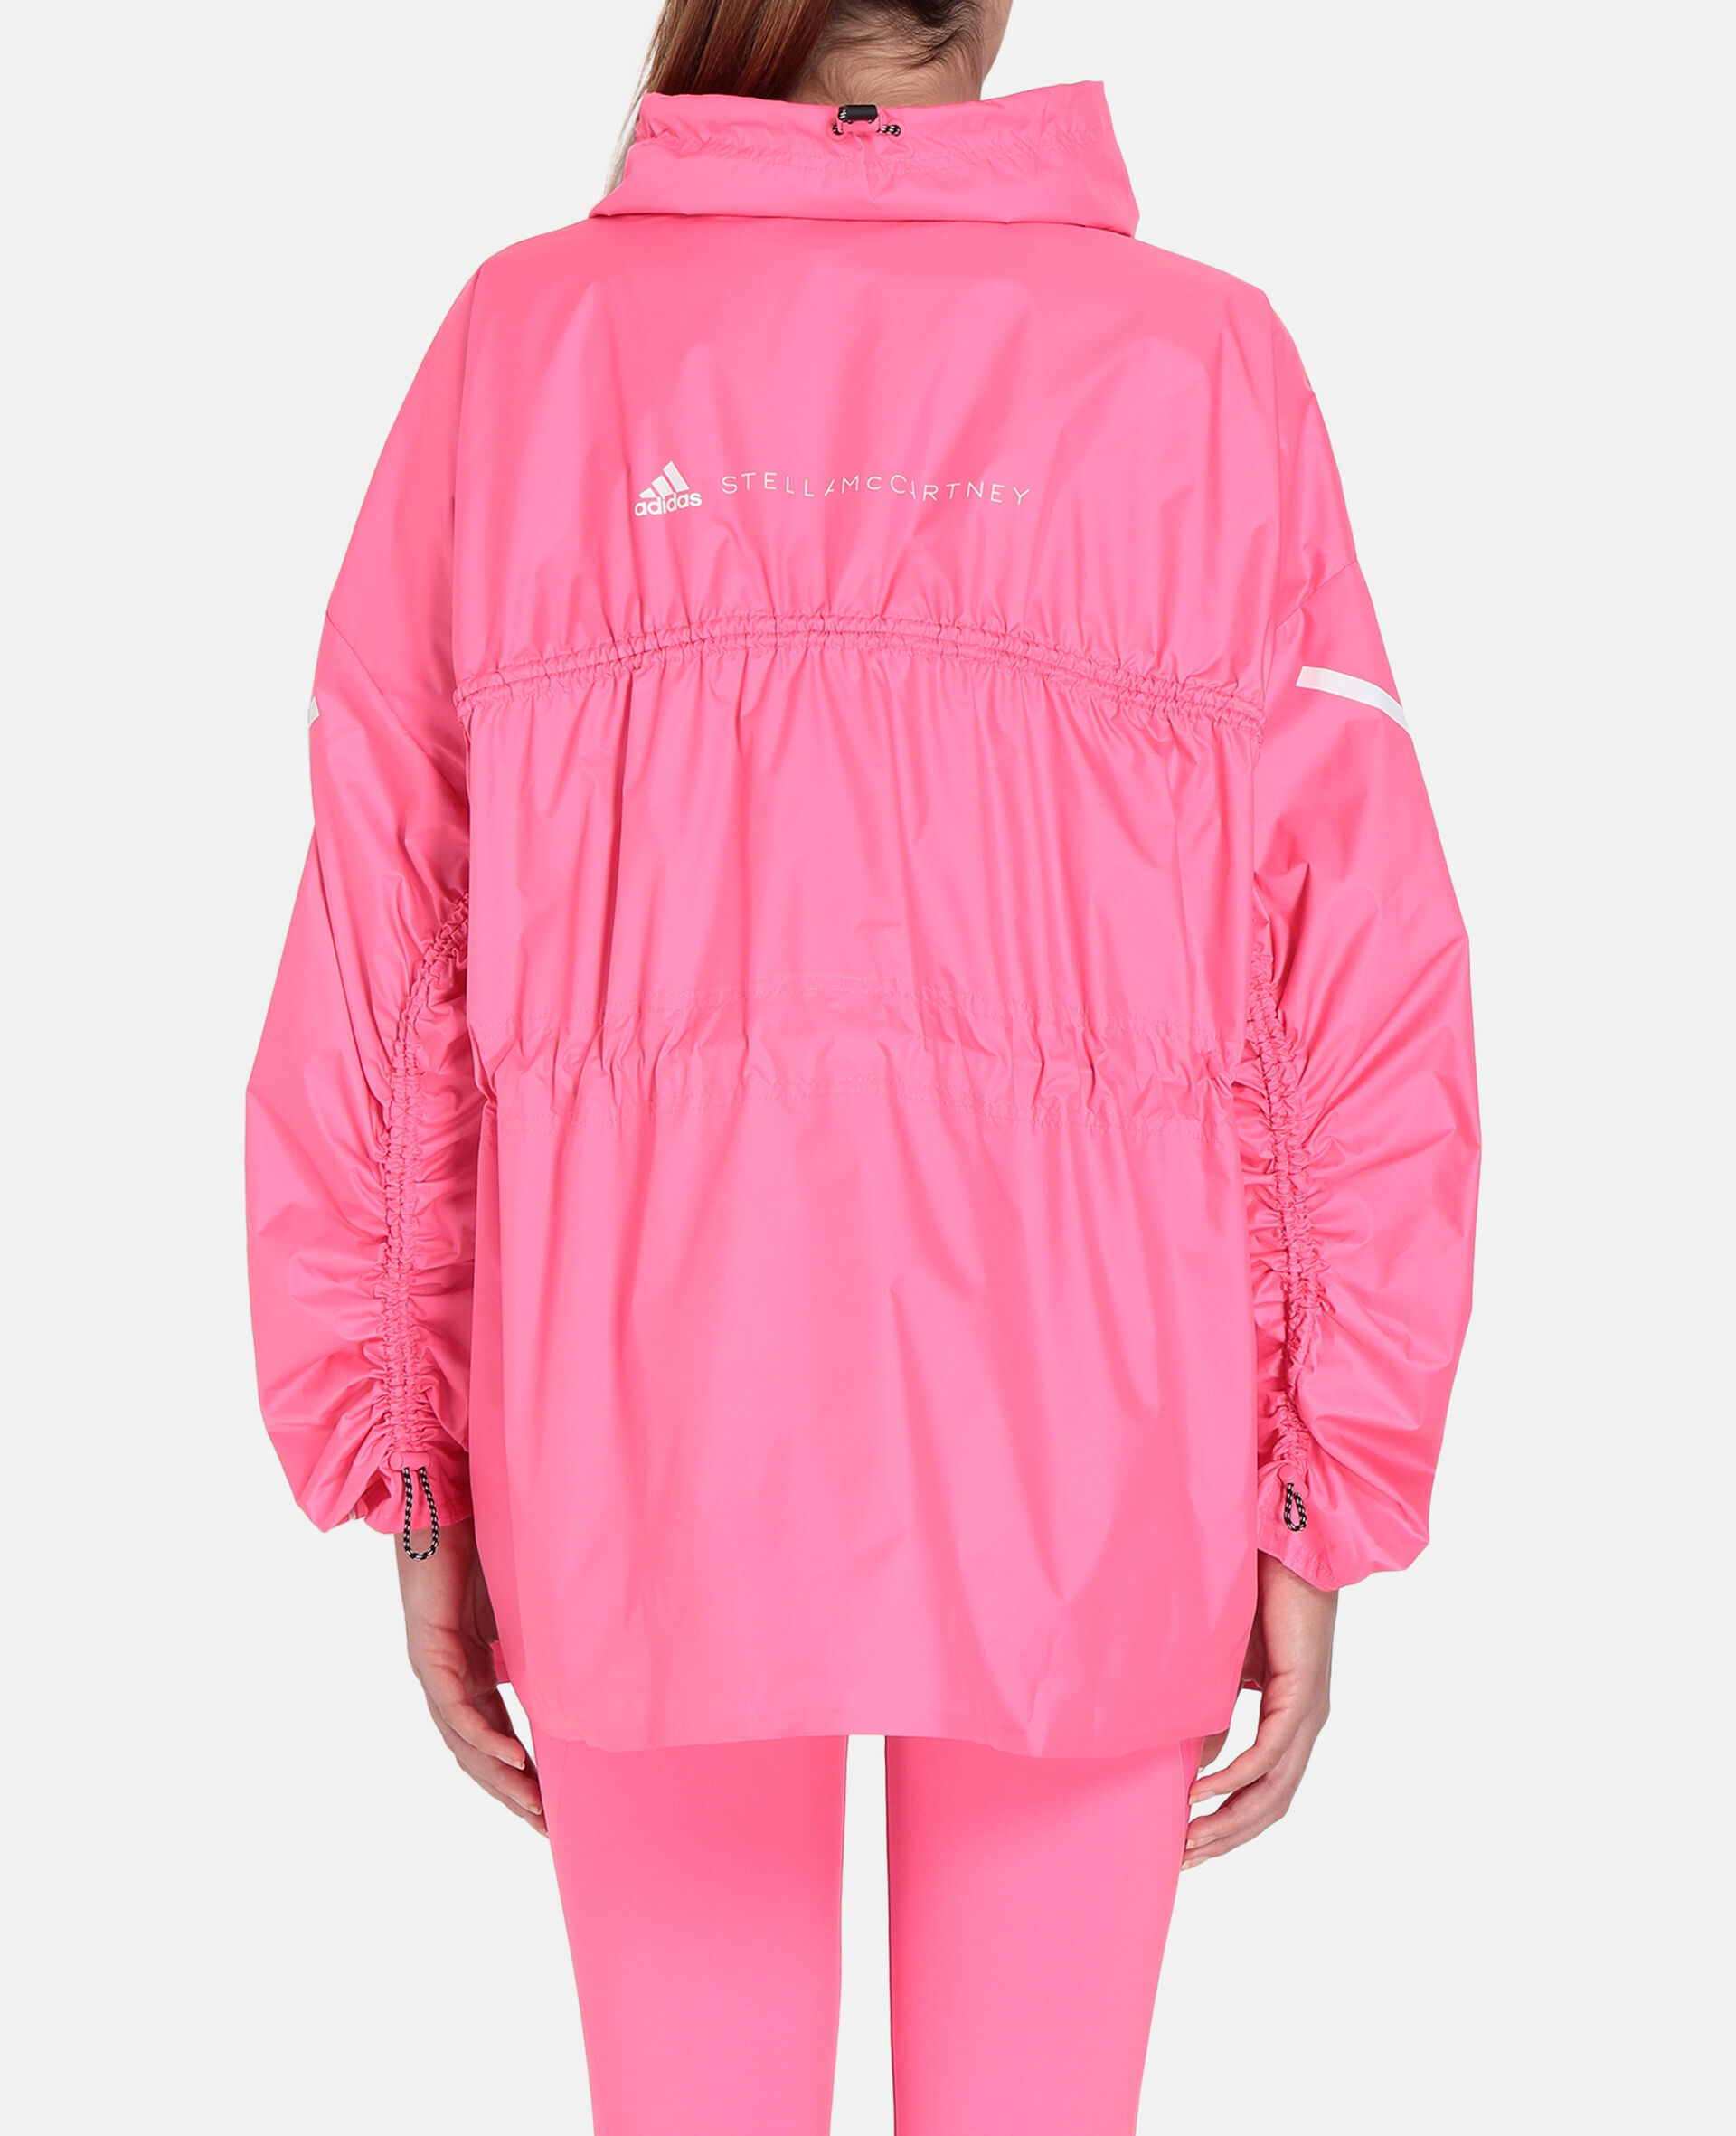 Pink Half-Zip Jacket-Pink-large image number 2